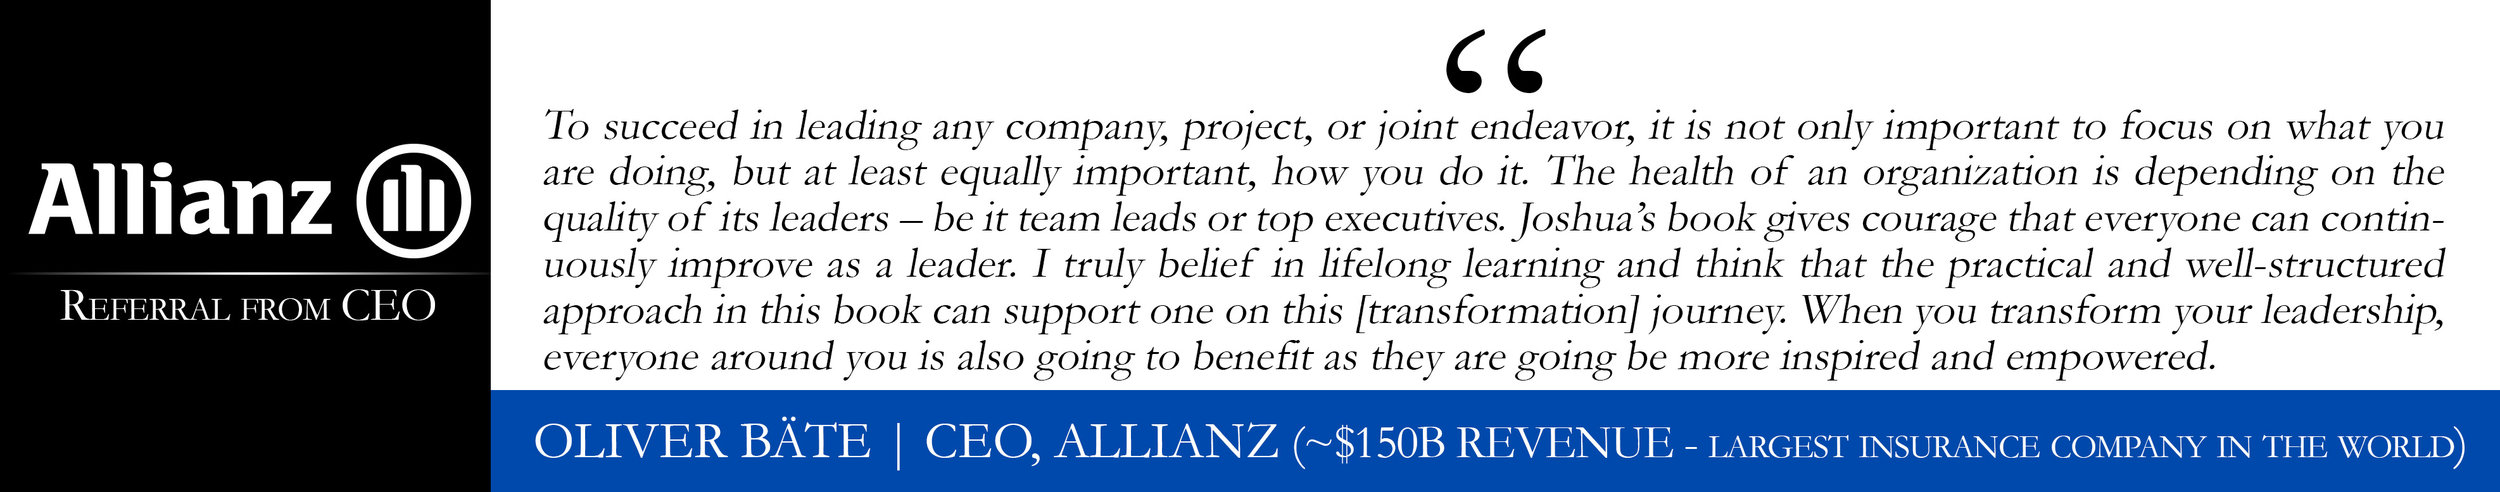 Leadership Redefined Quote 2.jpg